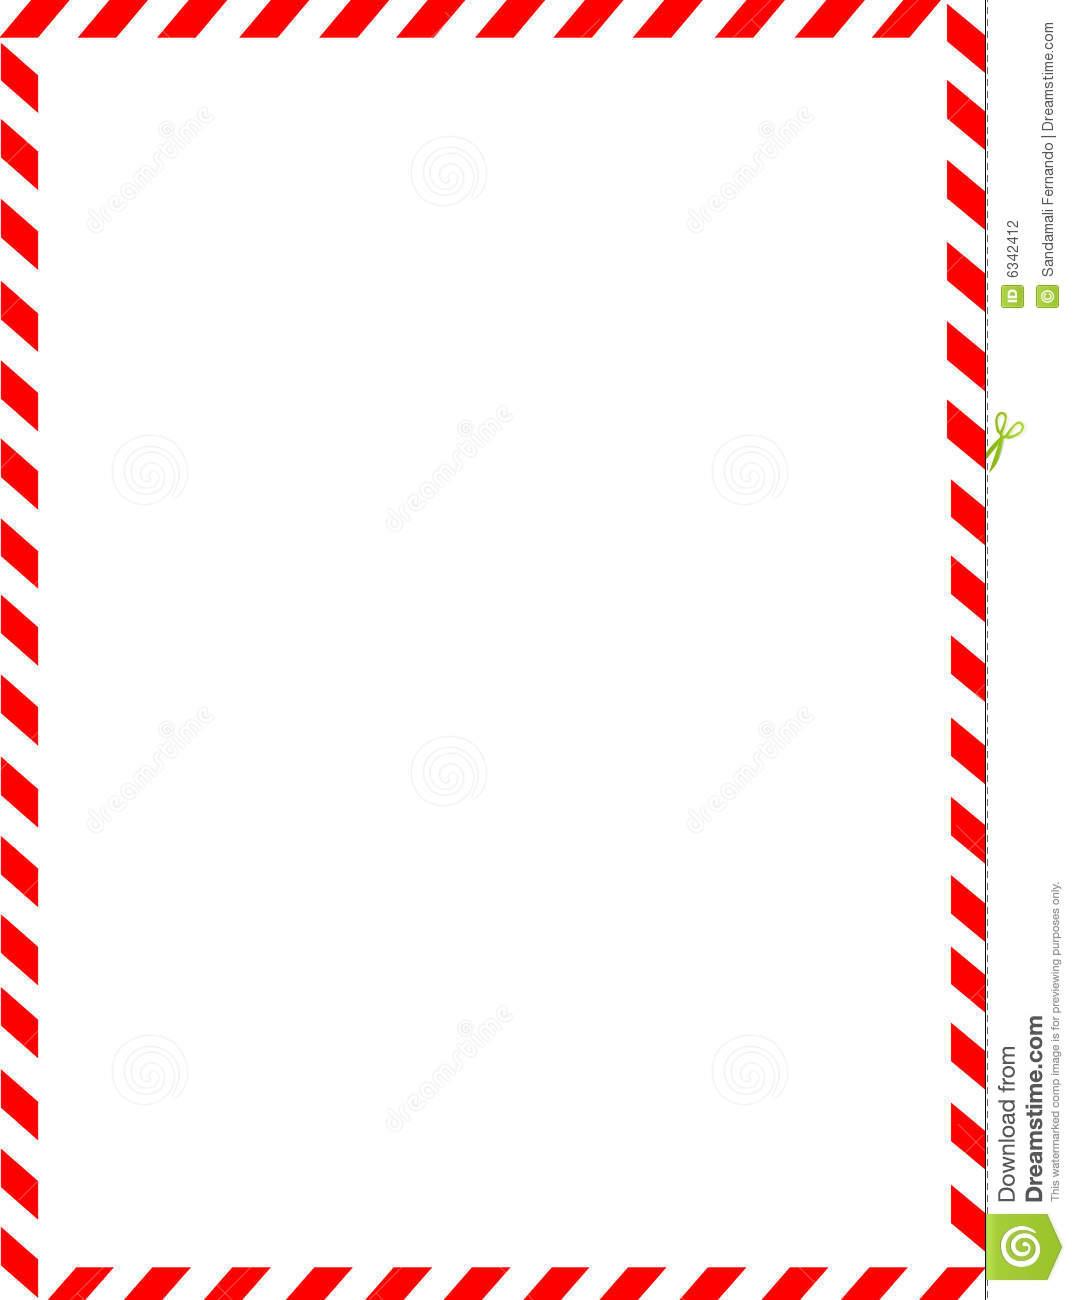 Clip Art Candy Cane Border Clip Art candy cane border clipart kid christmas borders